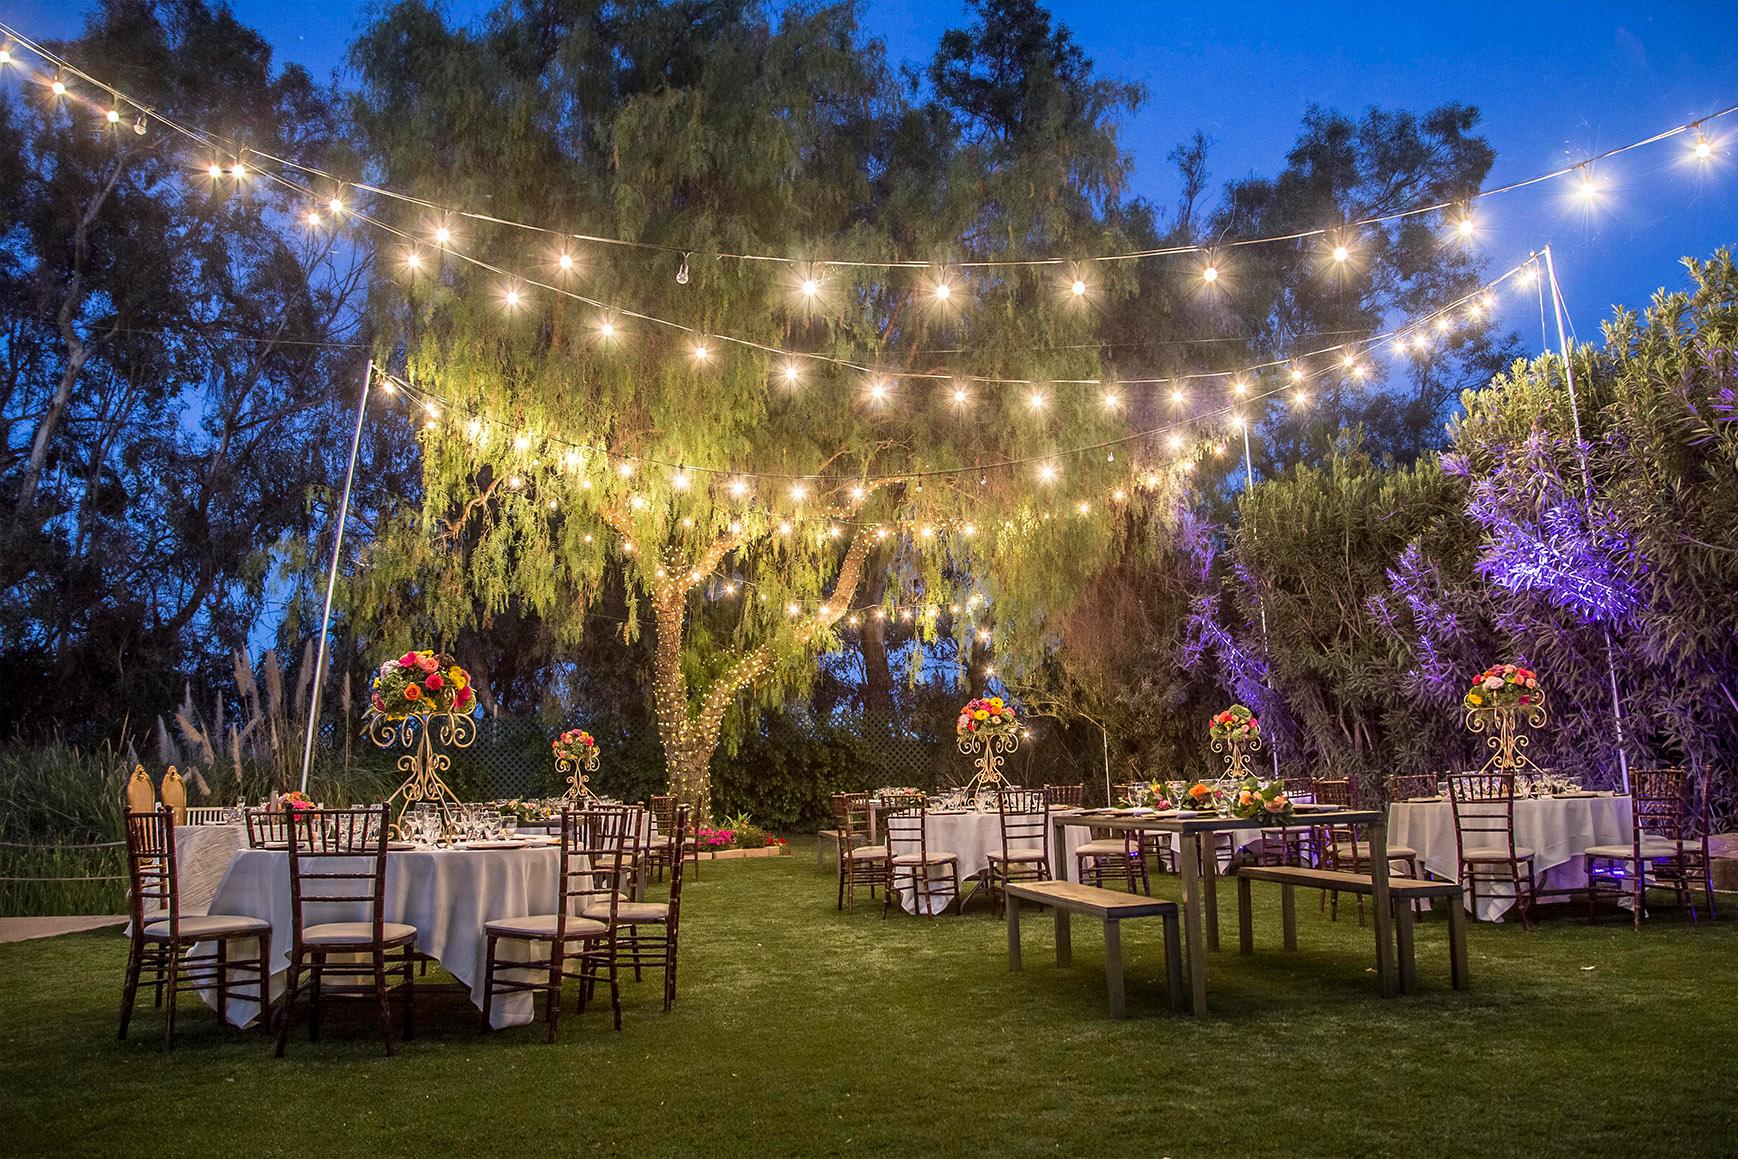 Reception twinkle lights - Orchard - Menifee, California - Riverside County - Wedgewood Weddings